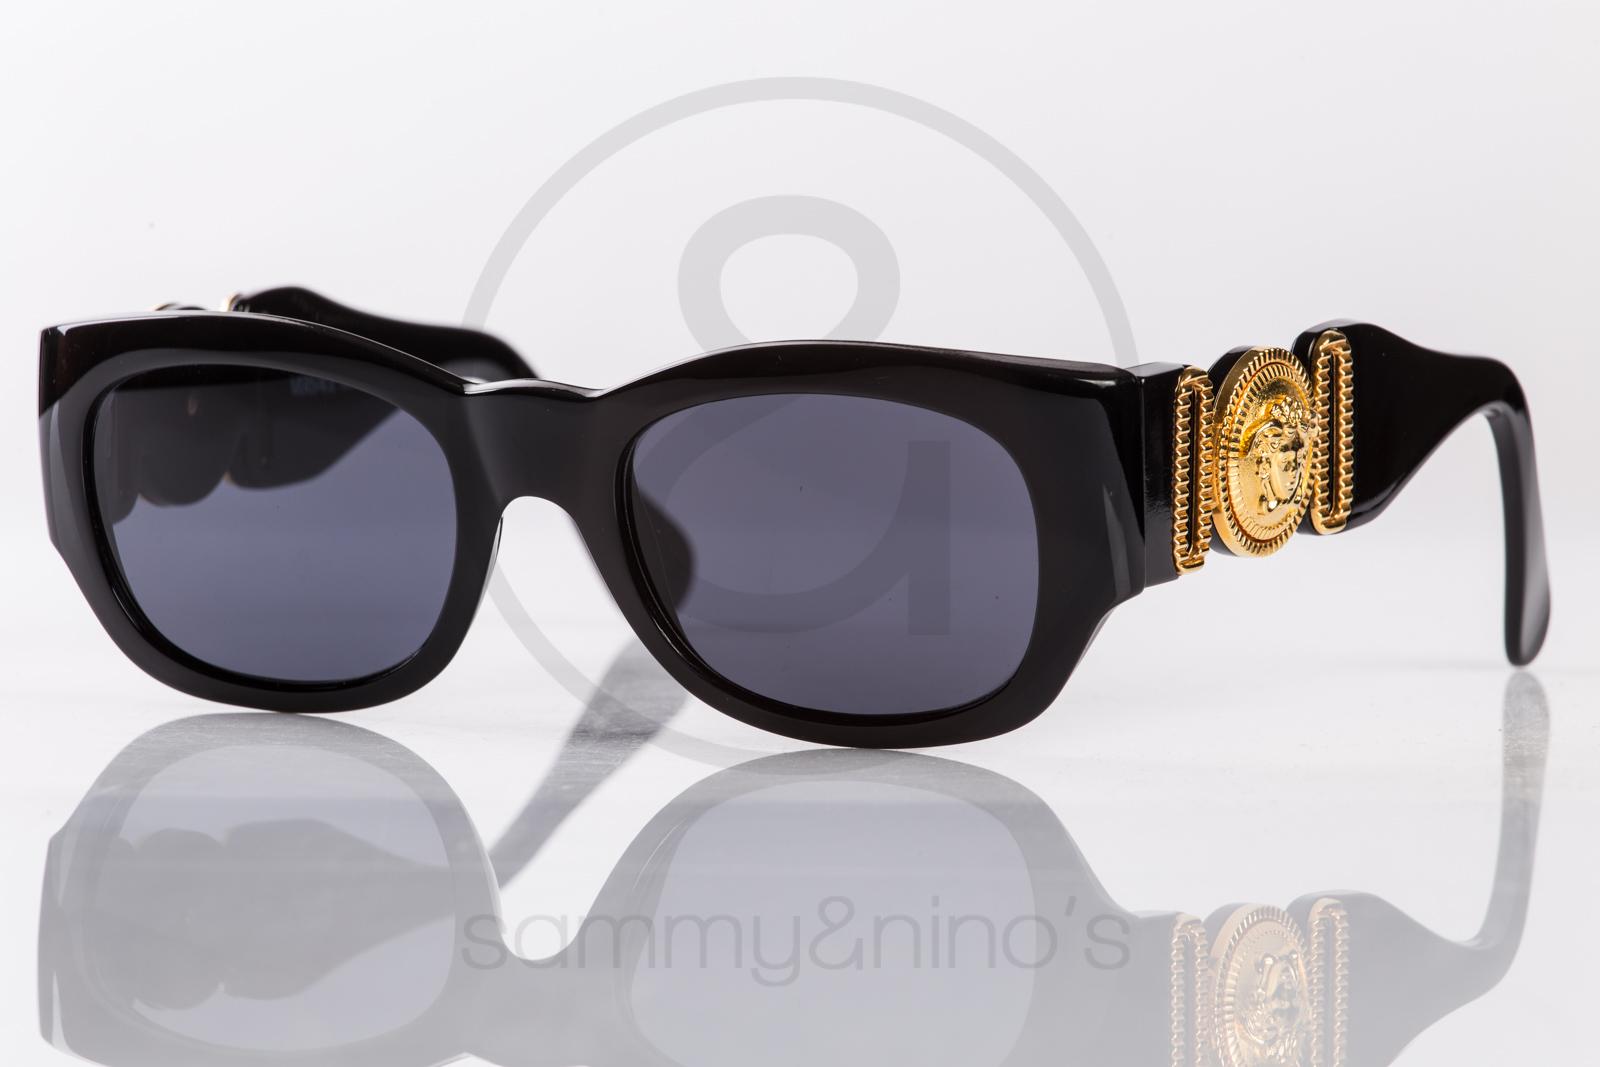 d72393eb78 Previous  Next. HomeSOLD OUTGianni Versace 413 a 852